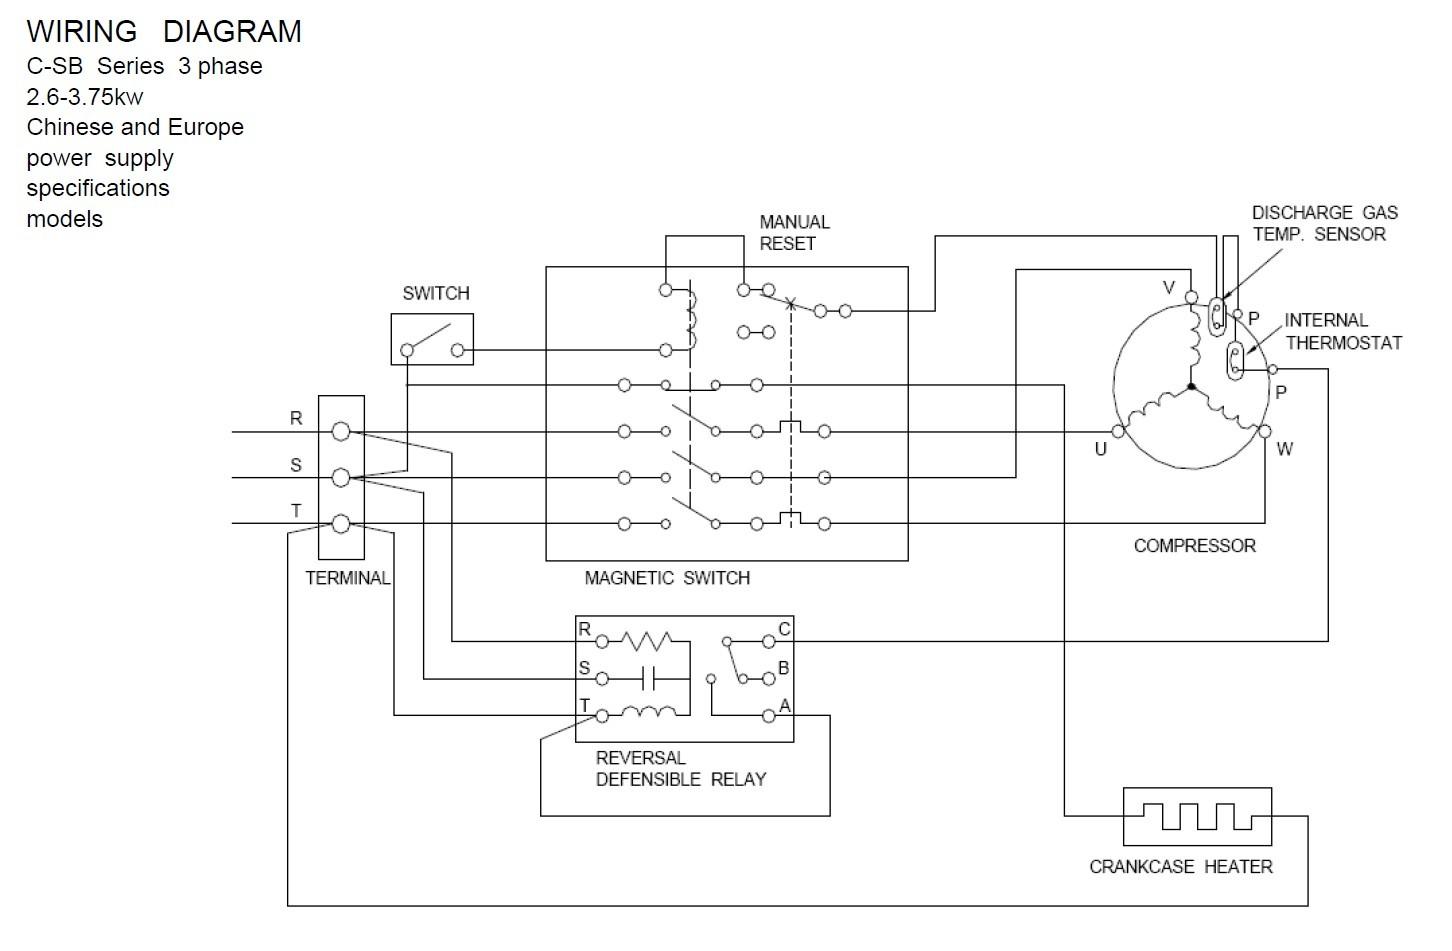 hight resolution of copeland condensing units wiring diagram wiring diagram todays rh 10 8 4 1813weddingbarn com diagram condensing